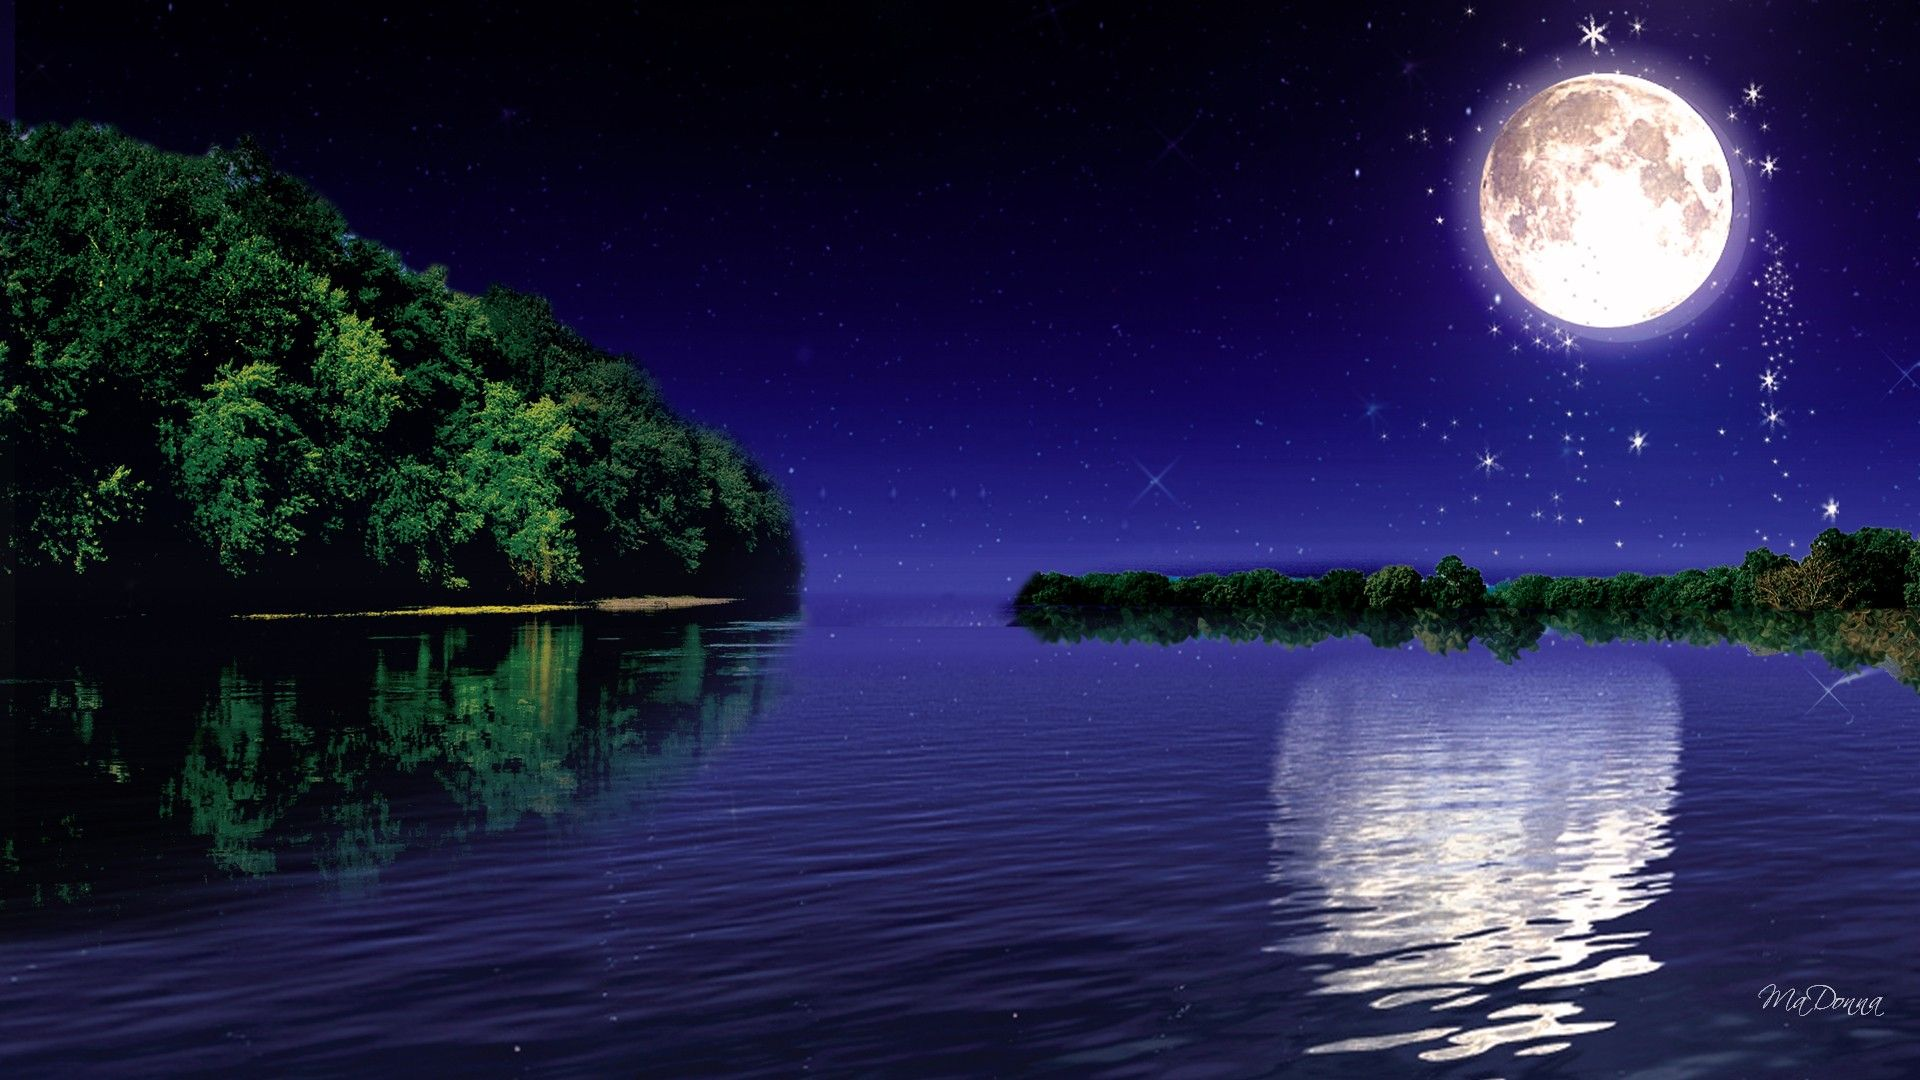 луна над водой картинка одном